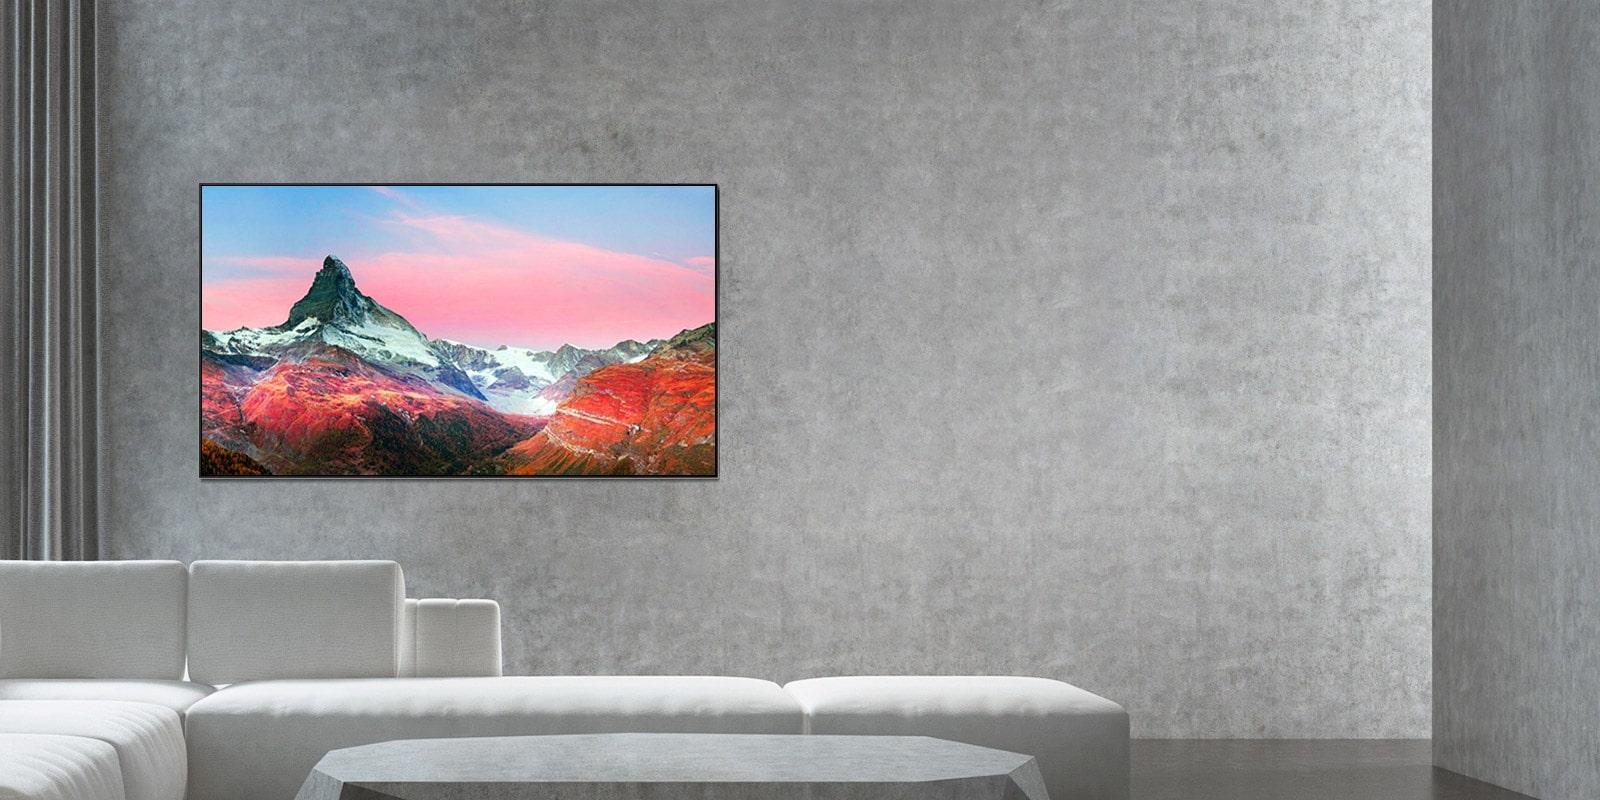 TV-OLED-Image-Retention-Desktop